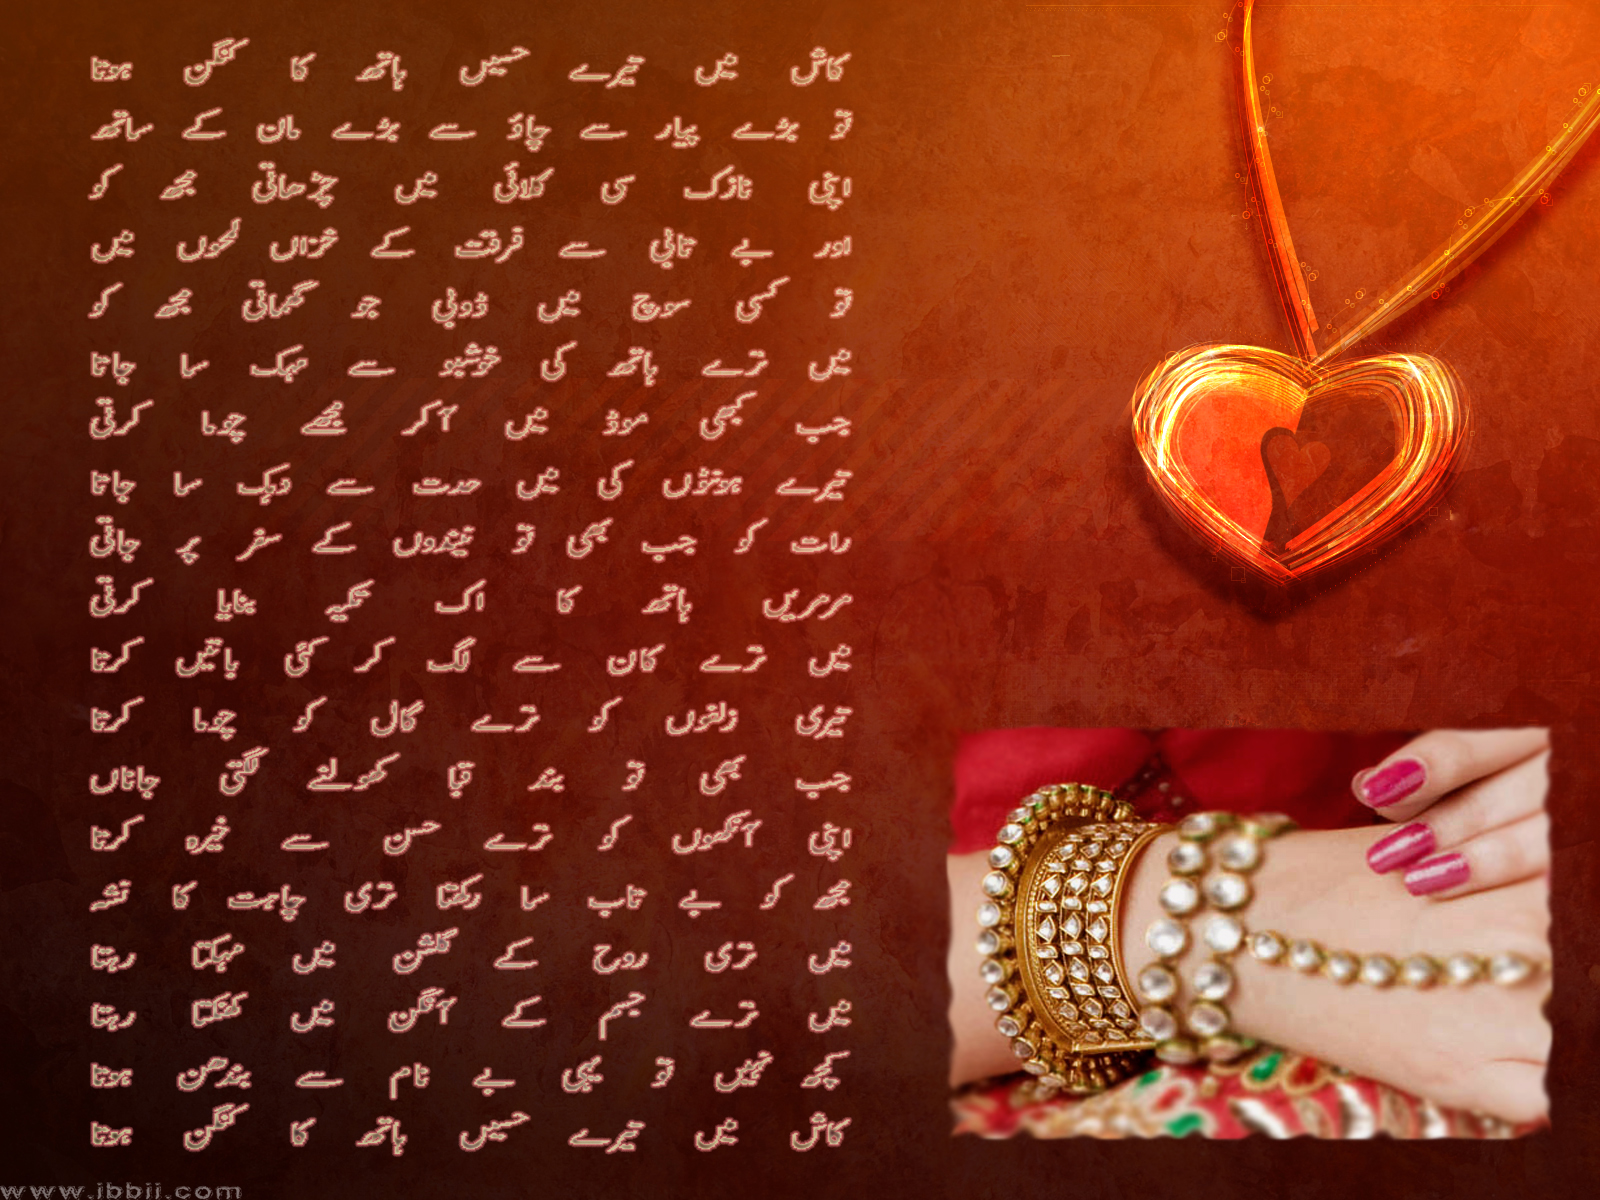 Beautiful Urdu Poetry wallpaper 1600x1200